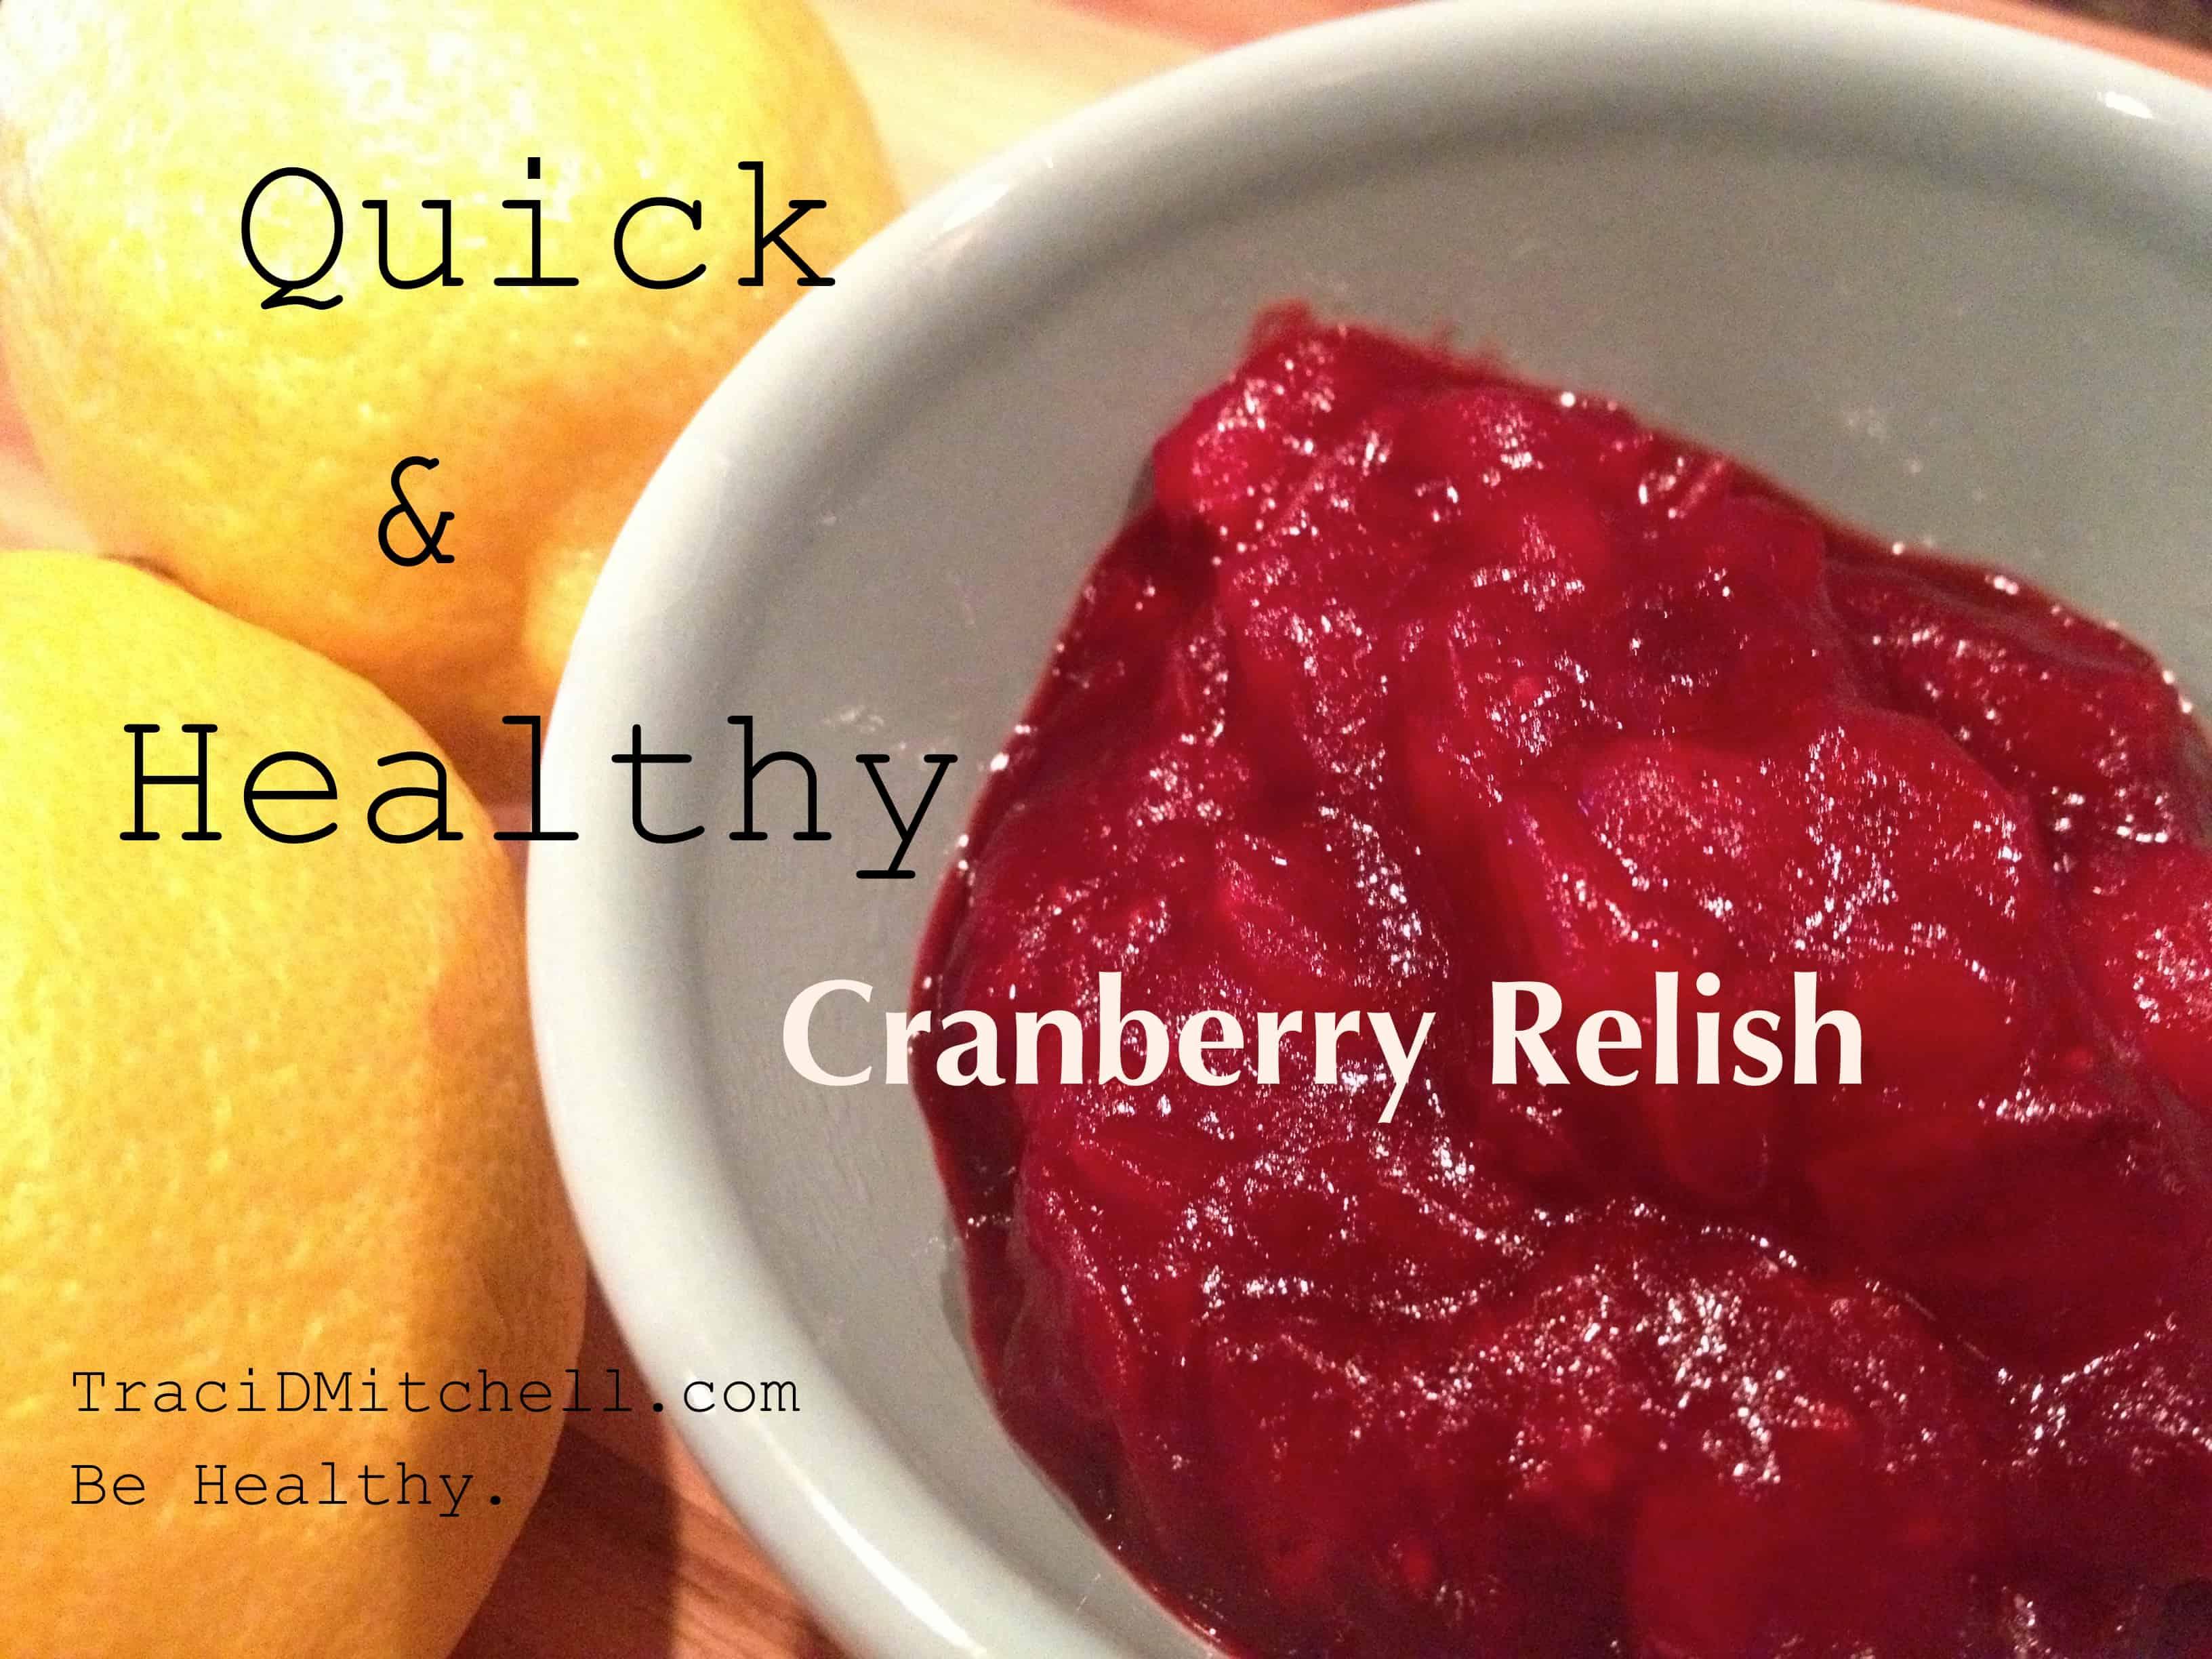 Healthy Cranberry Relish